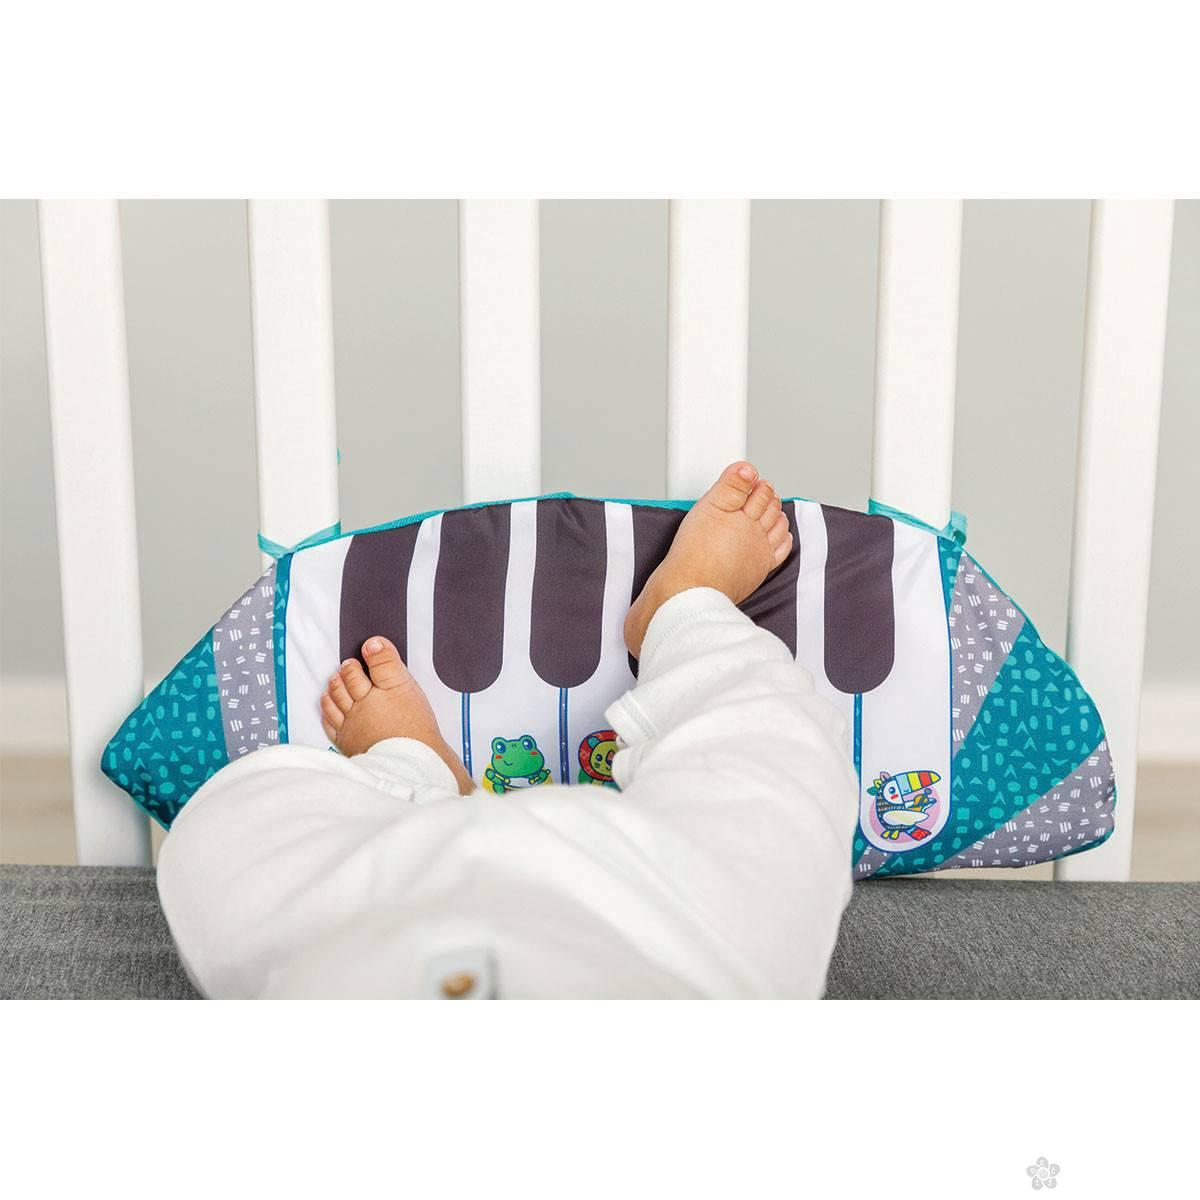 3 u 1 Crib and Tummy Time Kicking Piano 115208